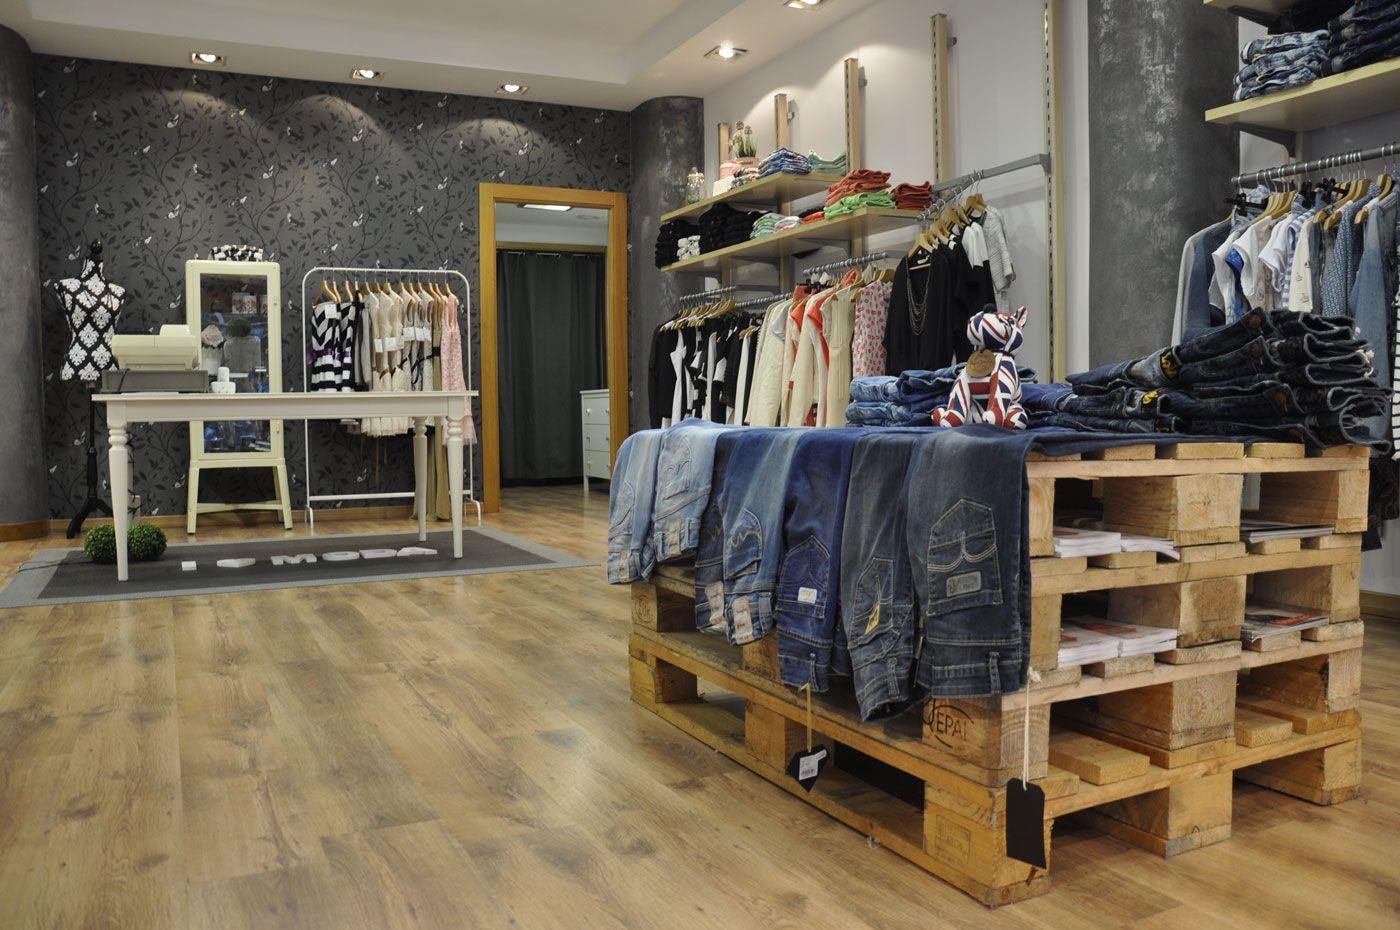 Dise os de tiendas de ropa buscar con google for Decoracion de almacenes de ropa